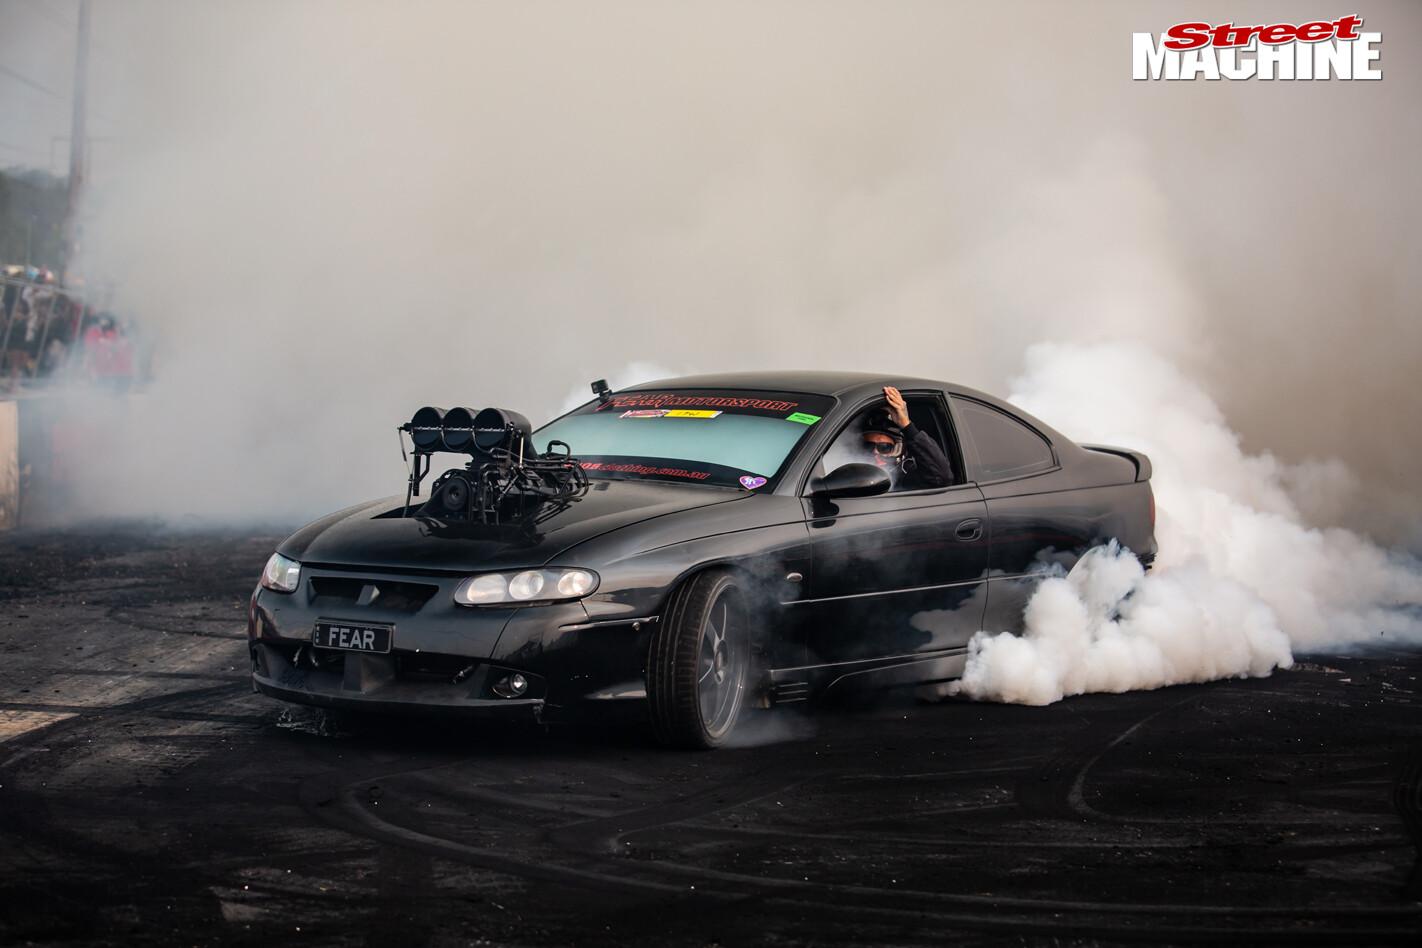 FEAR Monaro burnout car